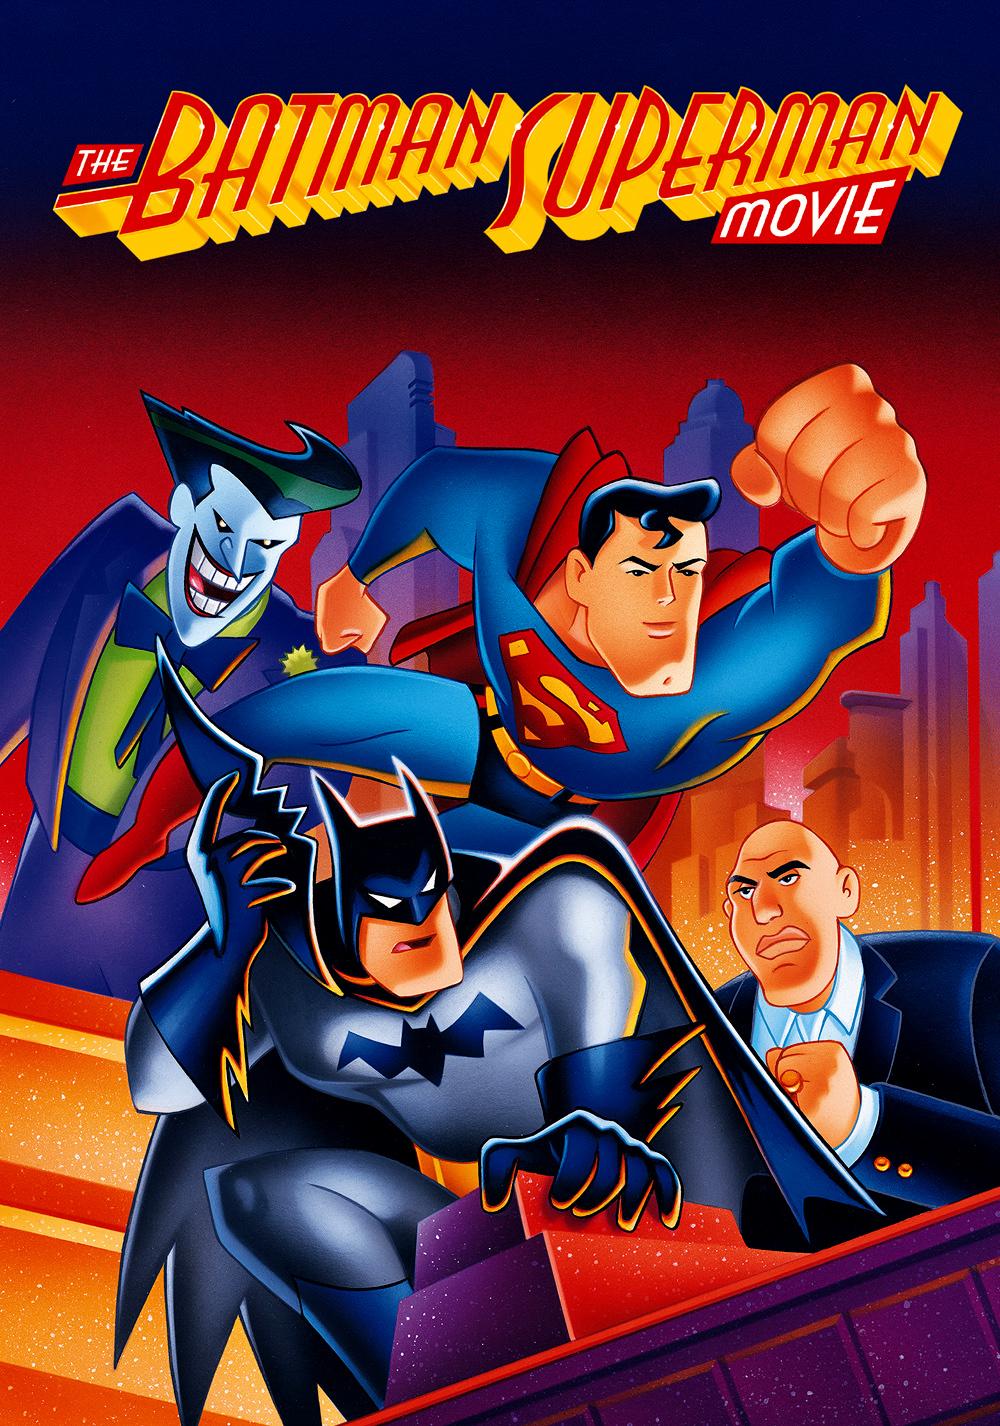 affiche du film The Batman Superman Movie: World's Finest